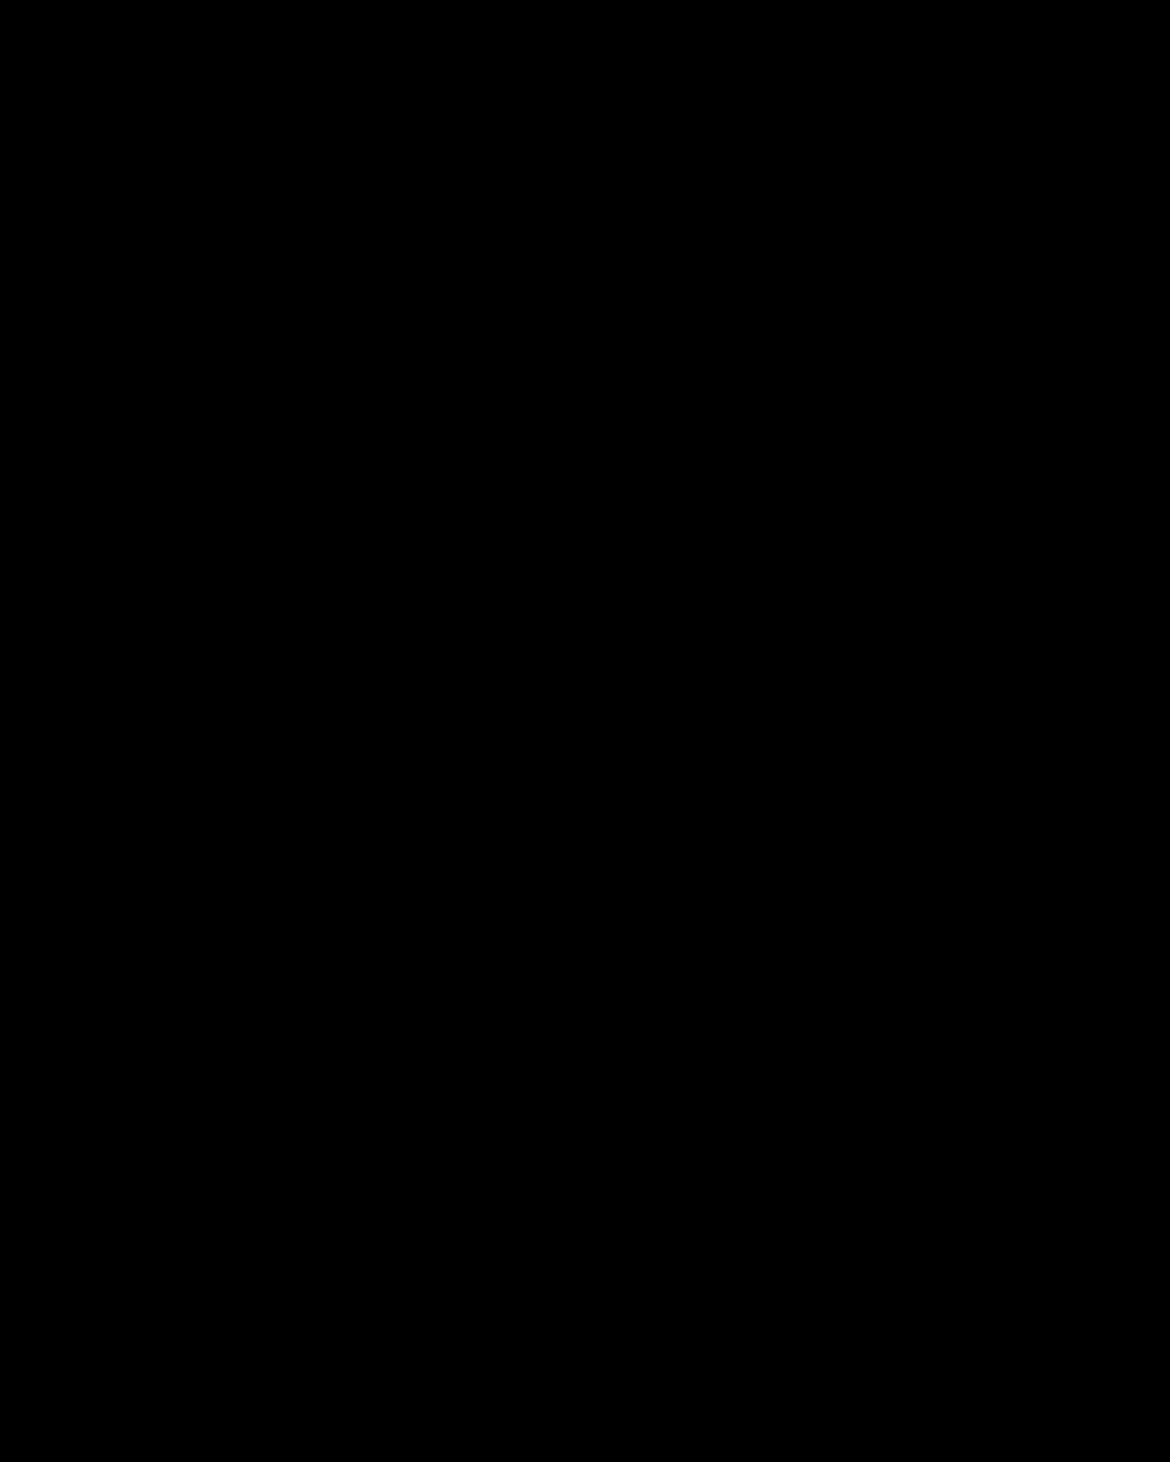 Visitare Parigi a Dicembre - La magia del Natale by Laura Comolli